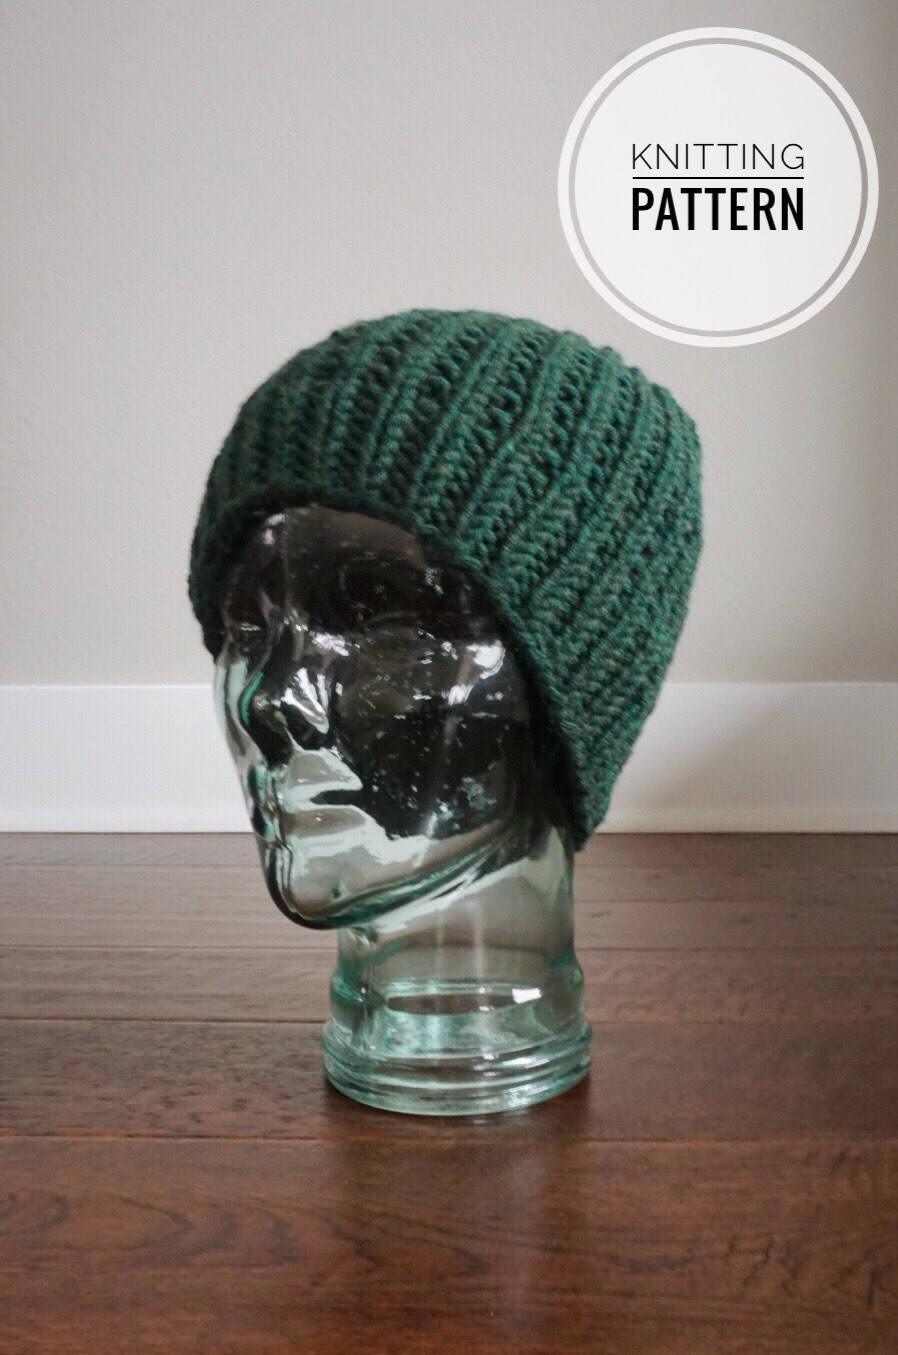 Knitting Pattern. Knit Hat Pattern. Womens Knit Hat. Knit Hat ...